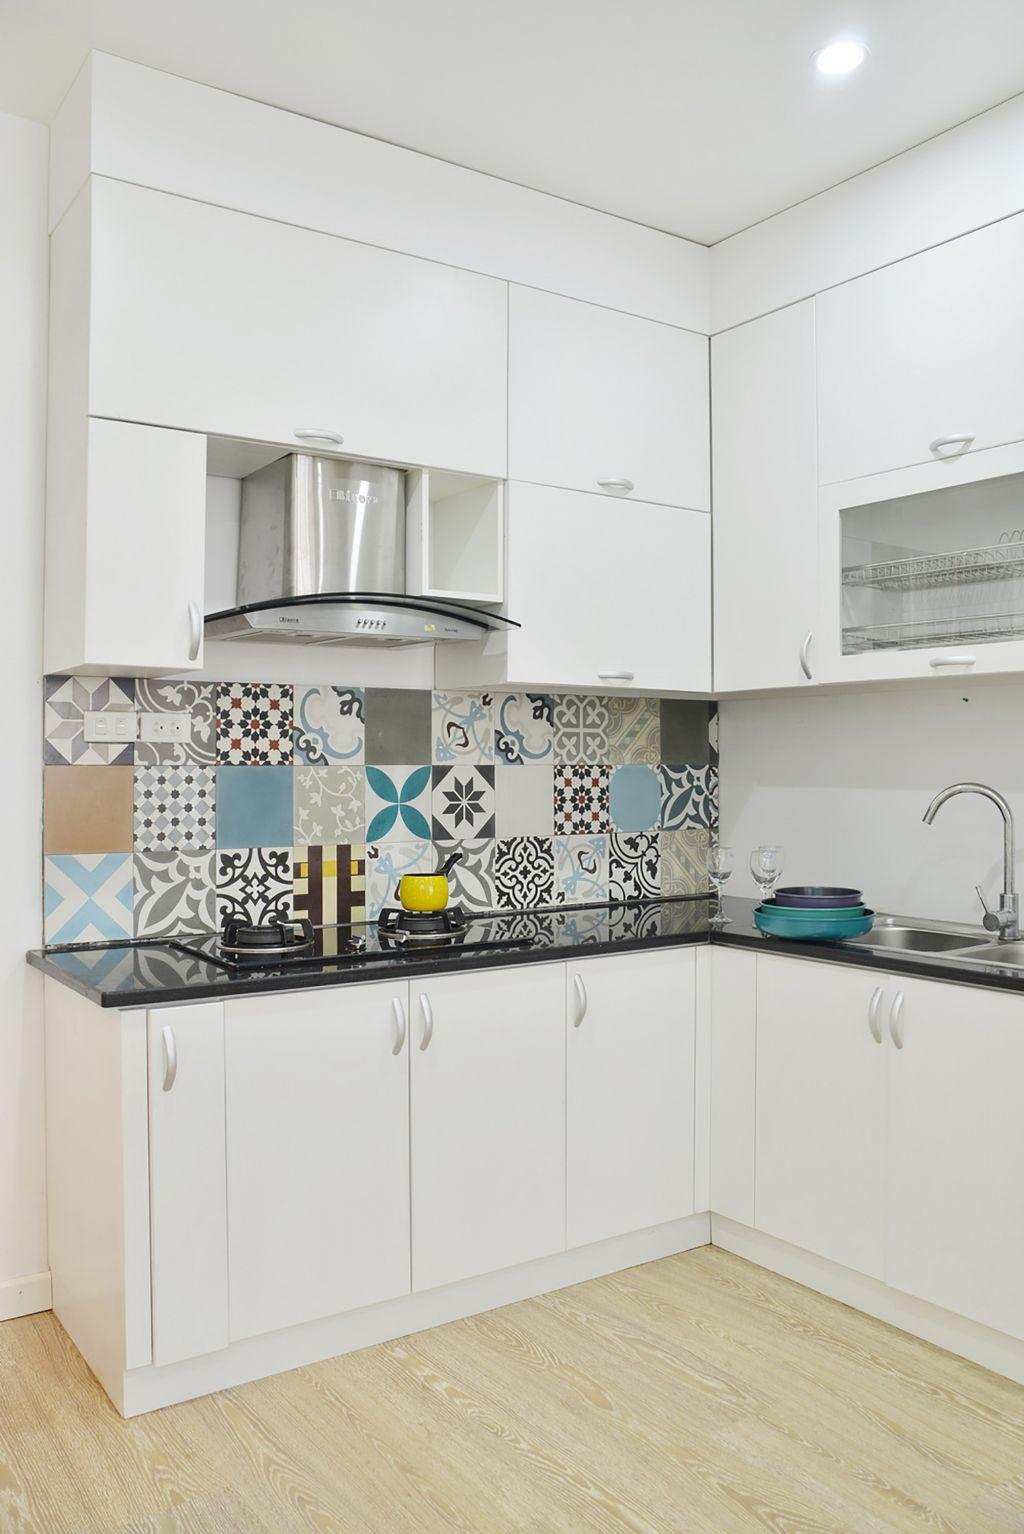 amusing colorful kitchen backsplash | Elegant Apartment In Hanoi Featuring Colorful Wall Tiles ...